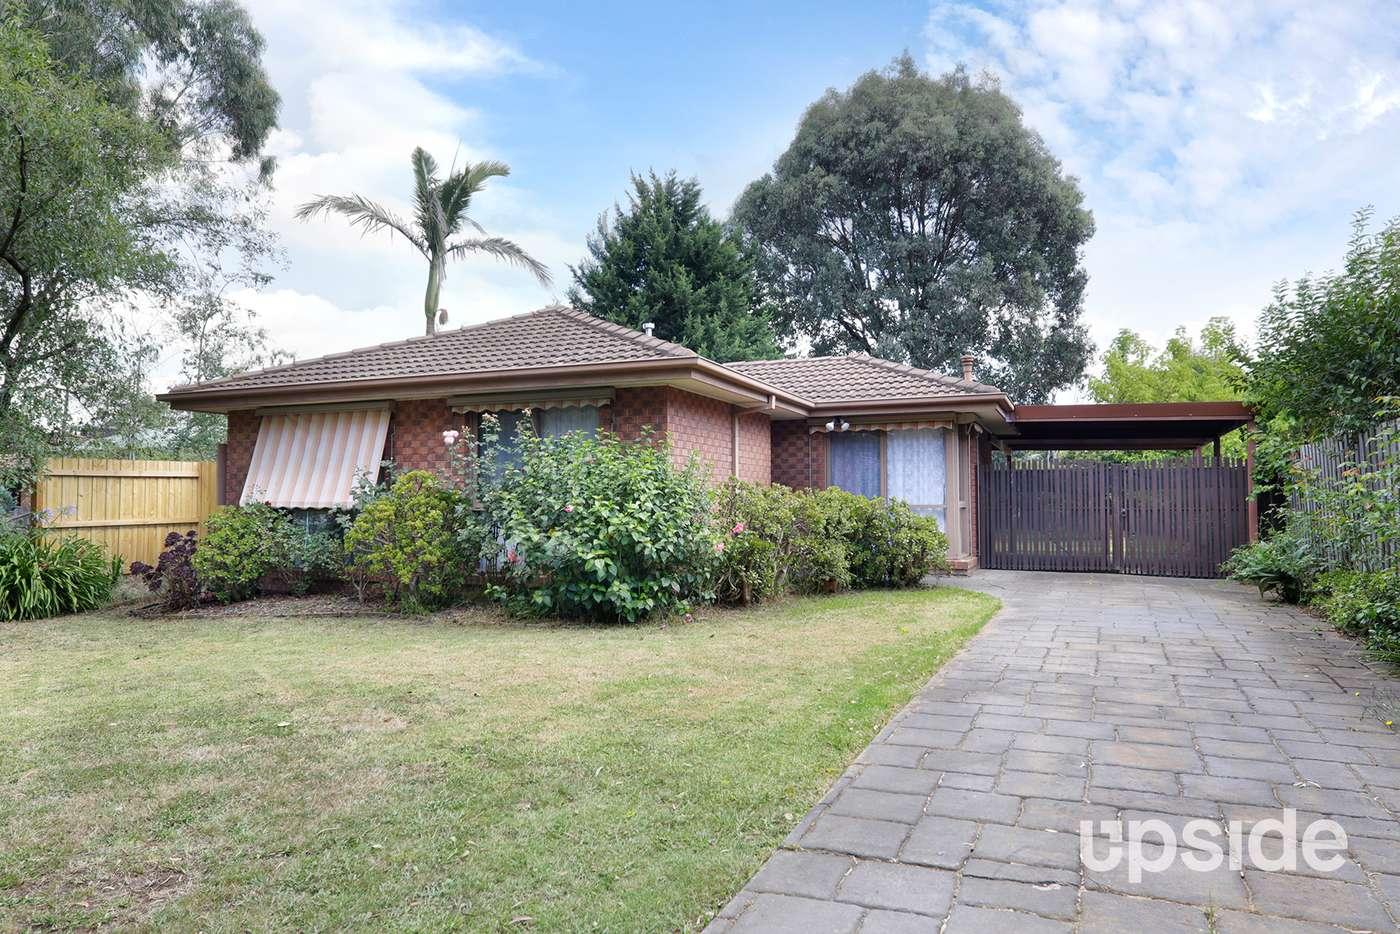 Main view of Homely house listing, 15 Mountain Heath Walk, Croydon South VIC 3136